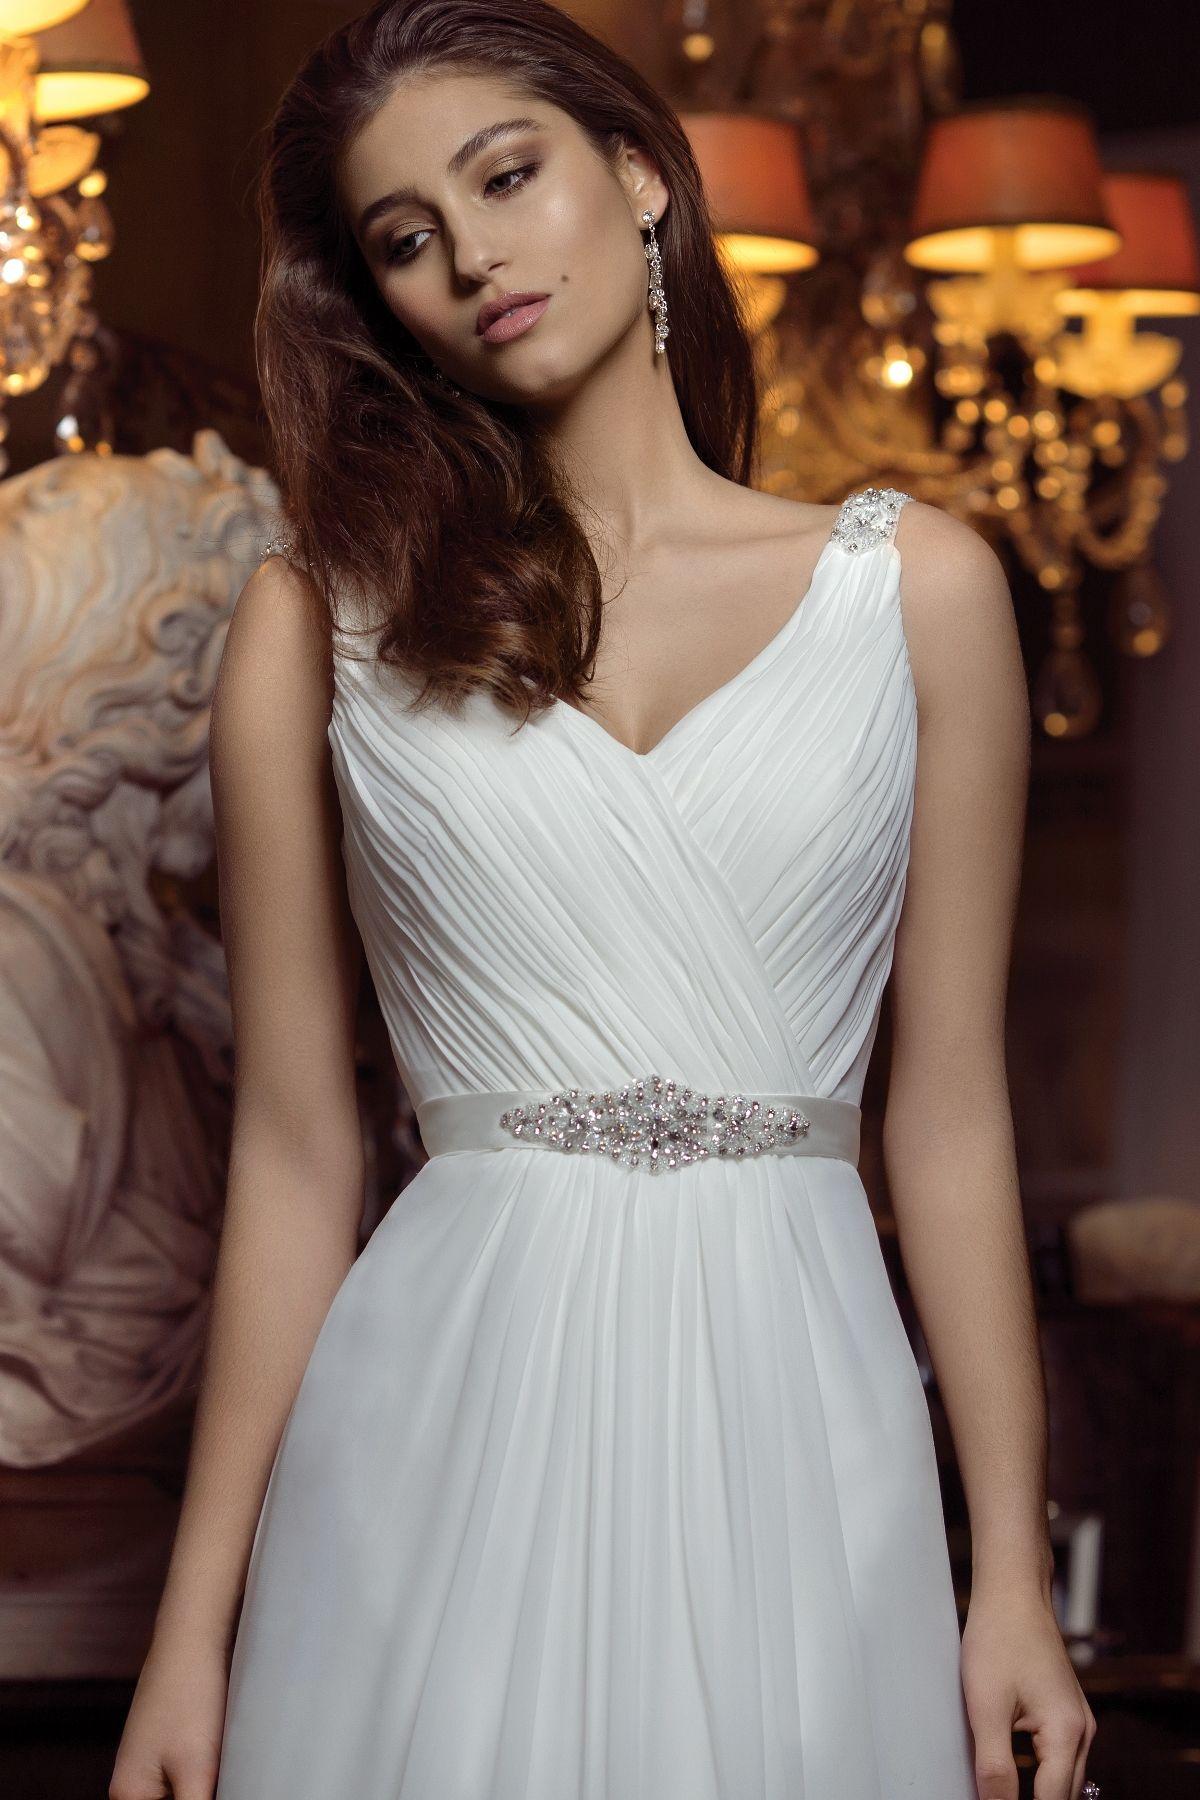 M1414Z Aspen Glam Wedding dresses, Chiffon wedding